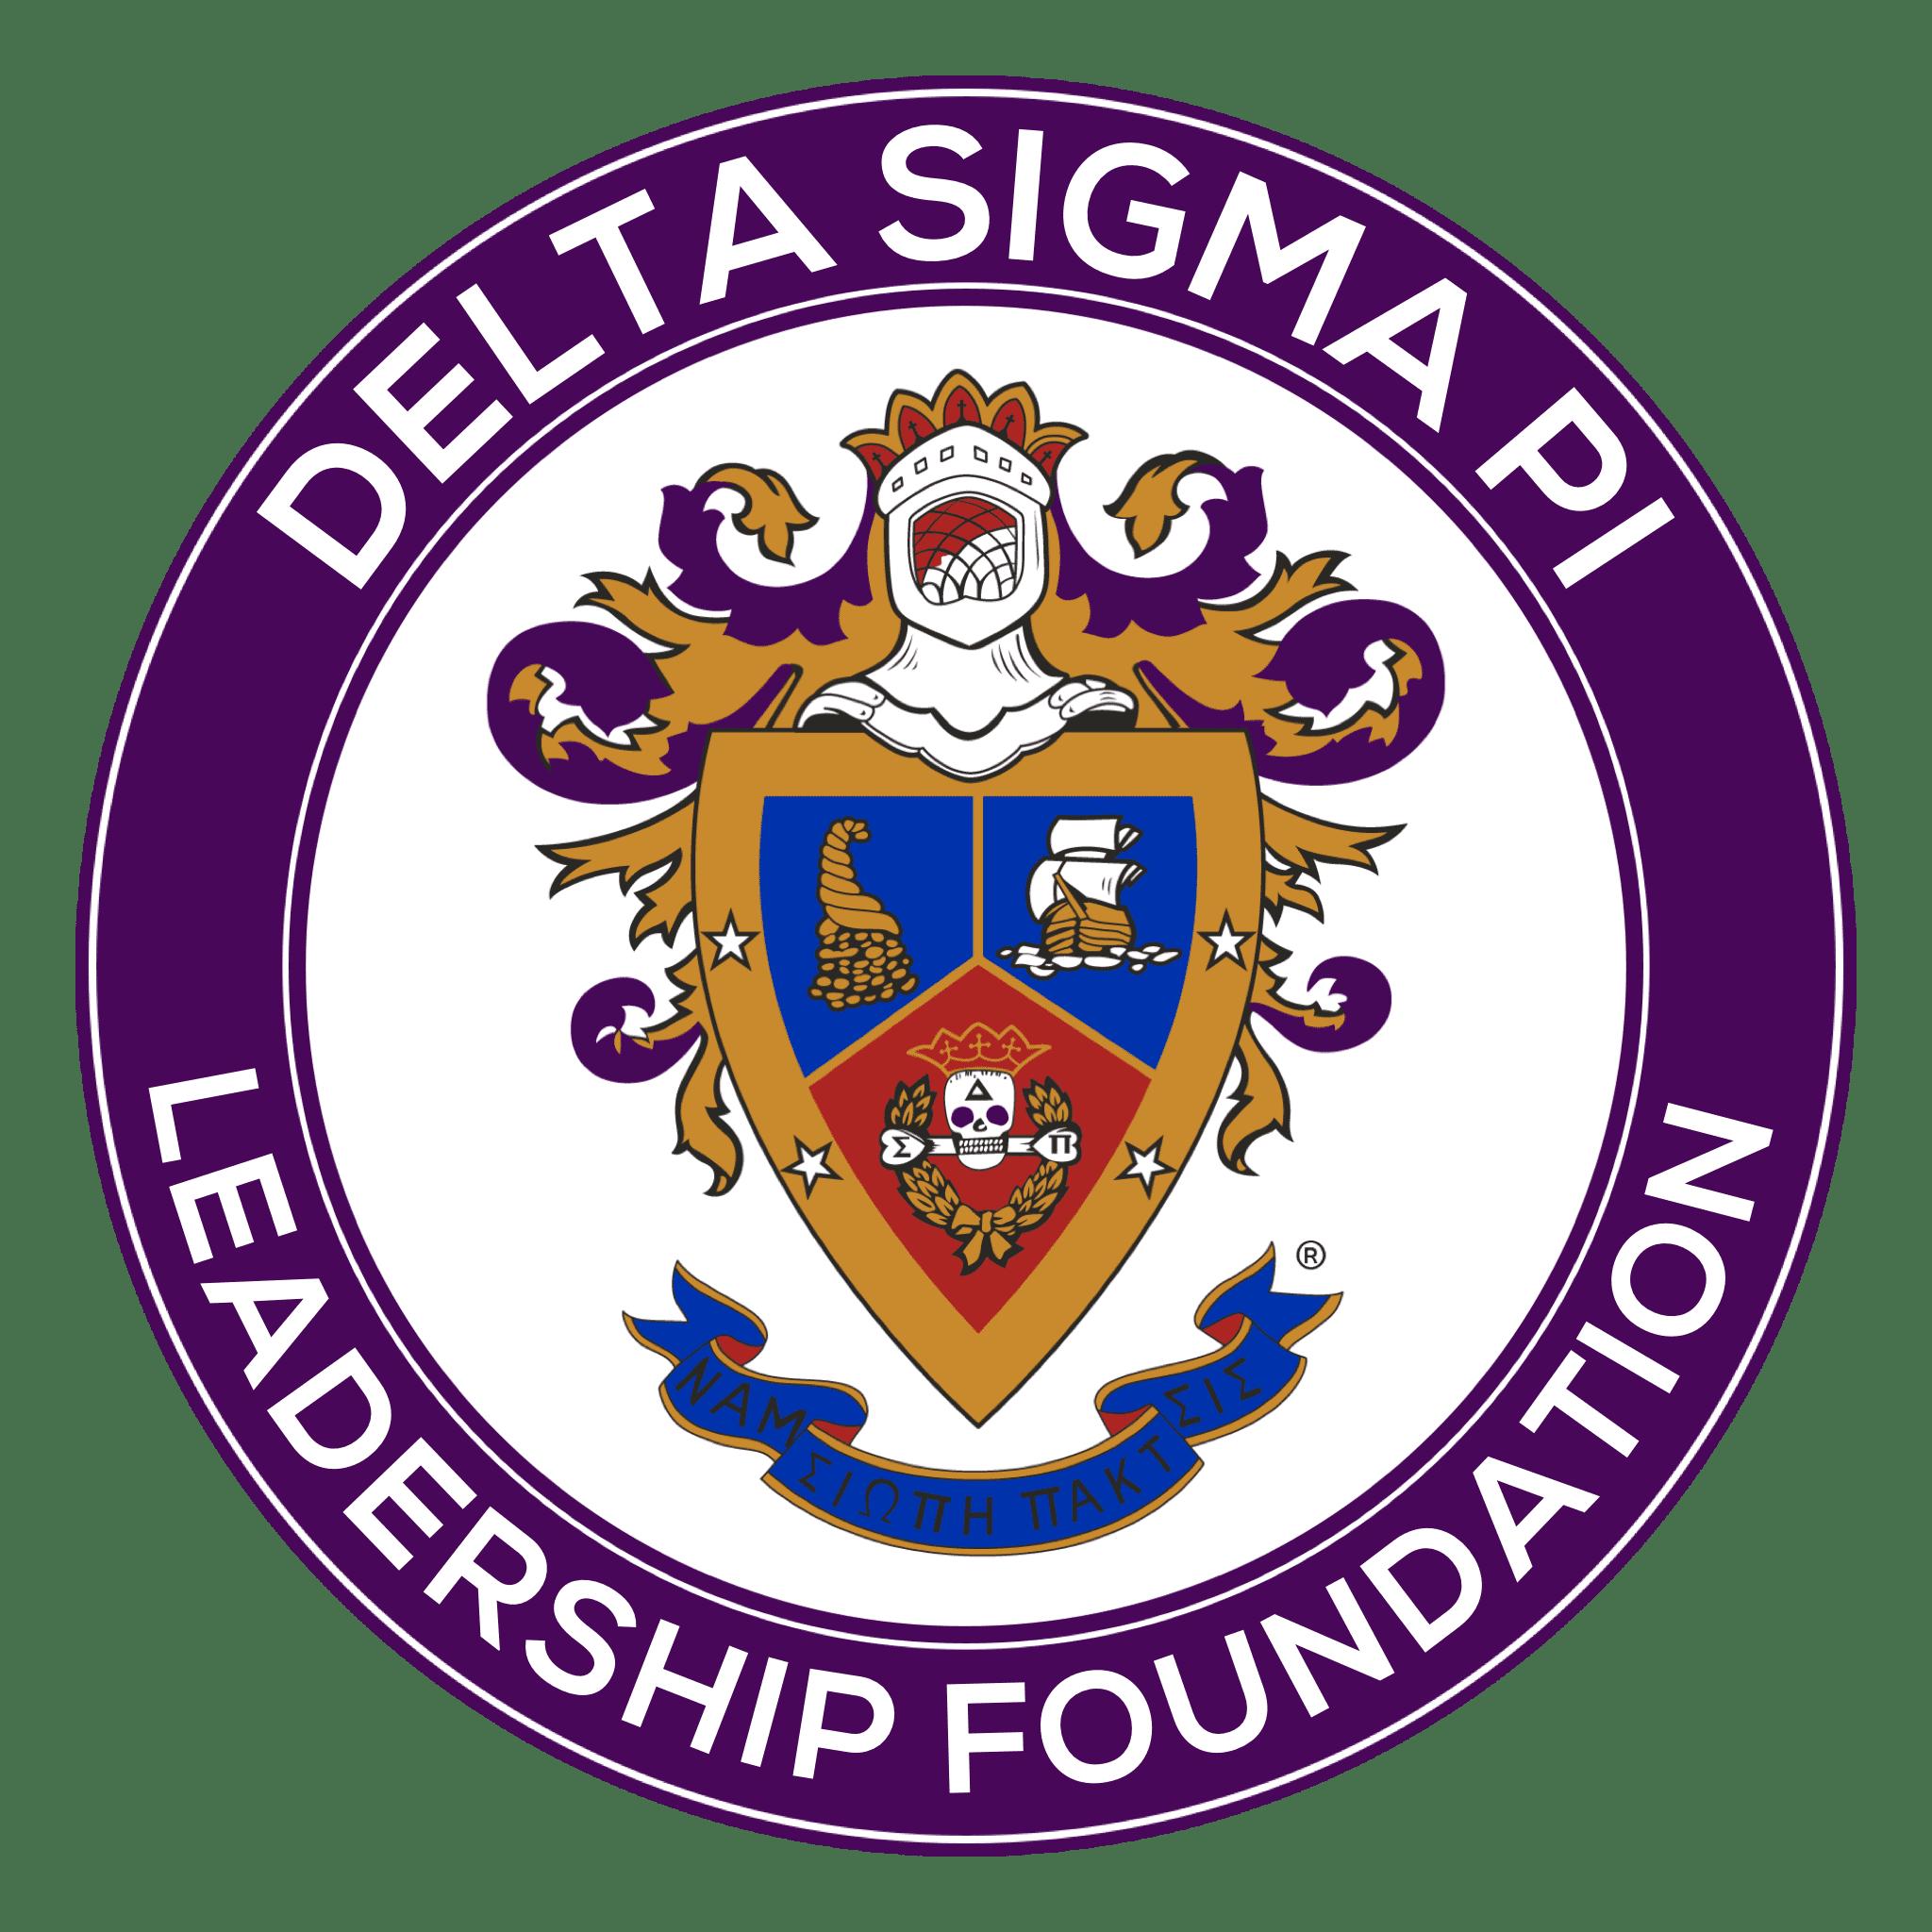 Leadership Foundation Seal - Full Color